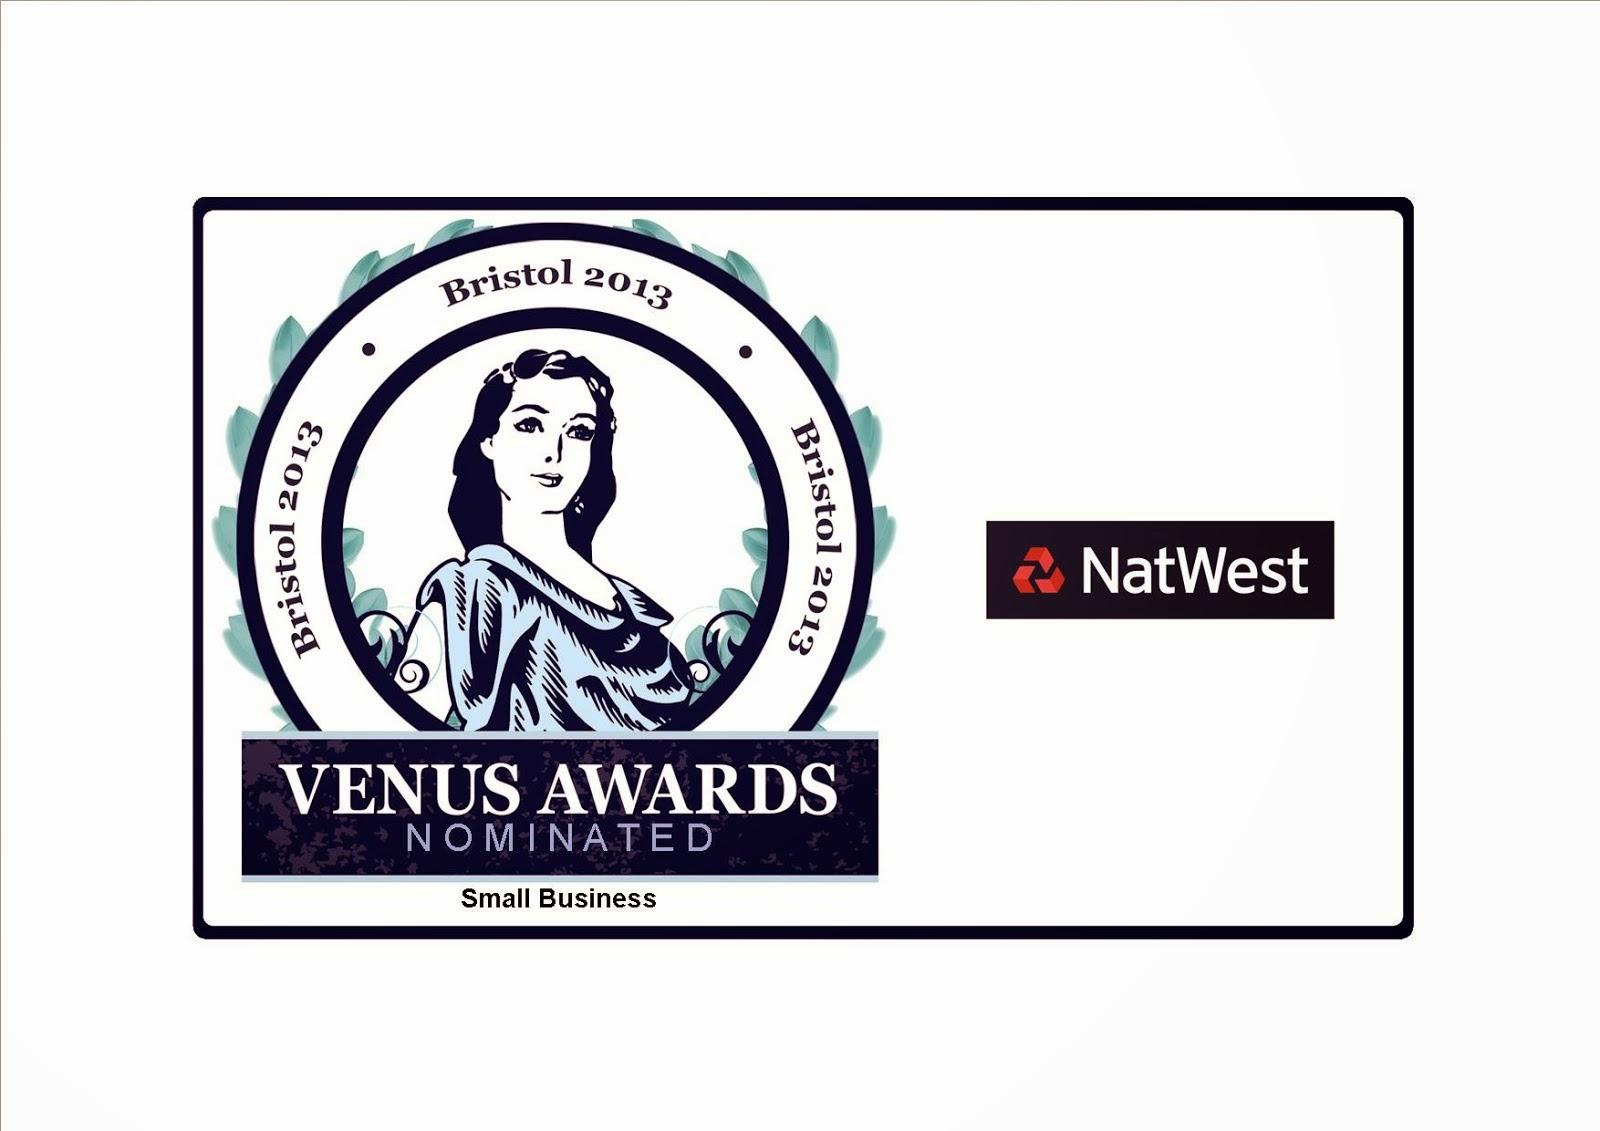 Venus Award Nominee